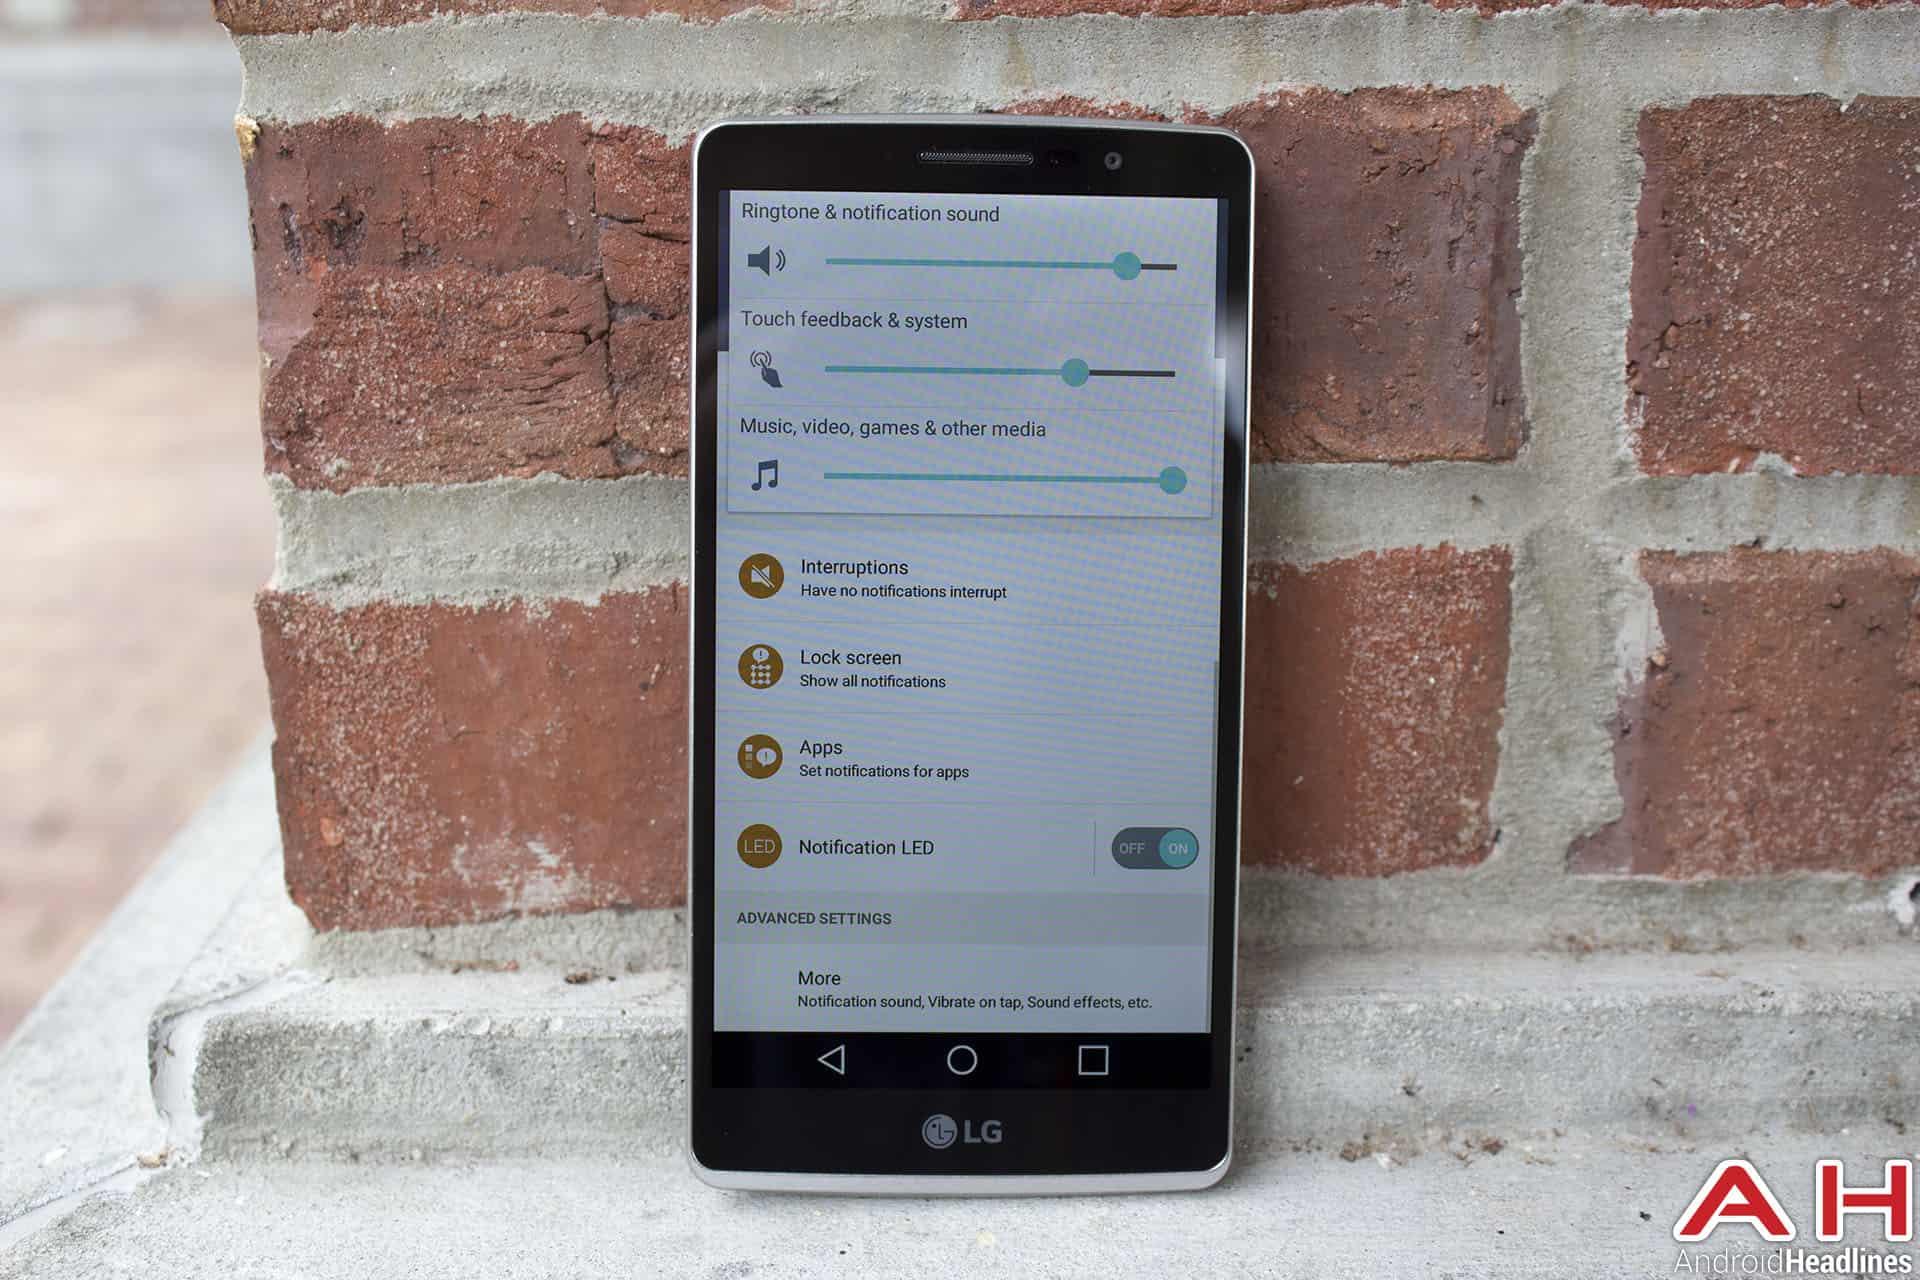 LG G Stylo Review AH ui 1